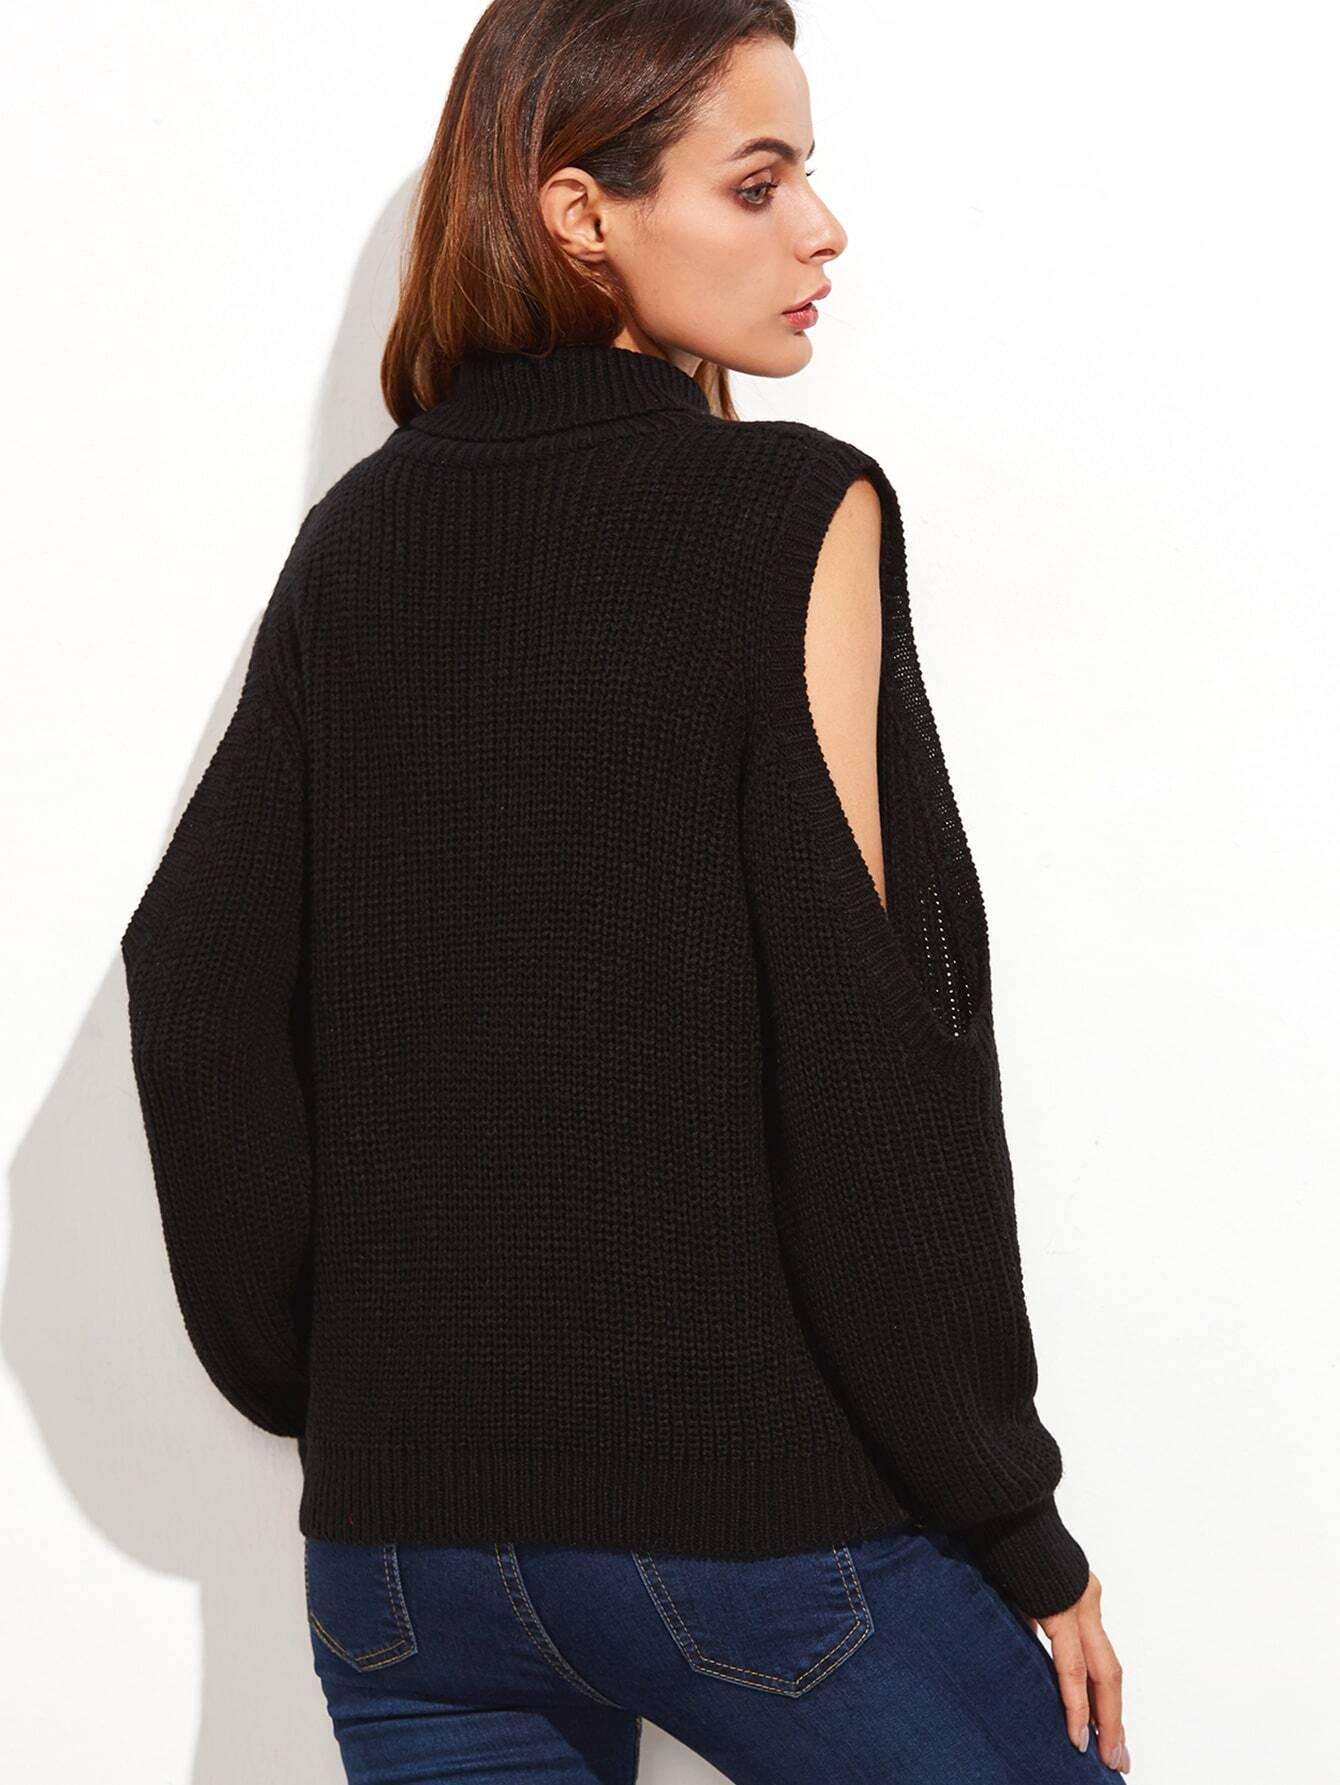 sweater160926453_2